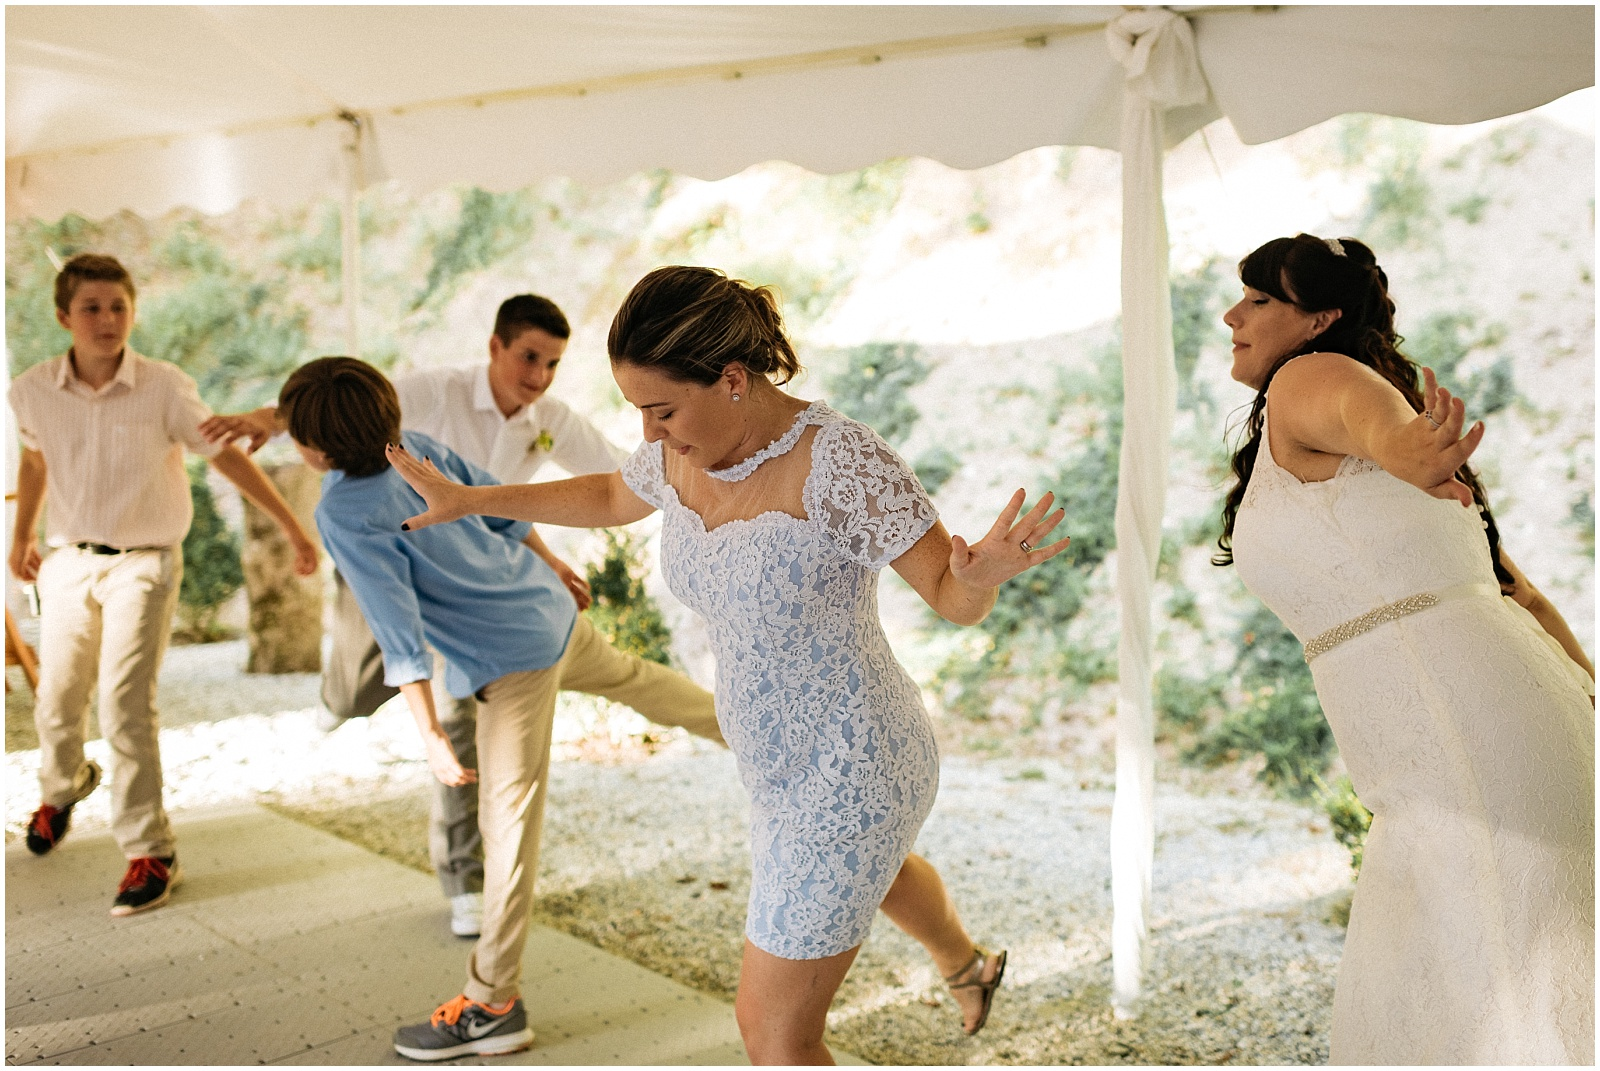 Ryan_Rechelle_Nantahalla_Weddings_Andrews_NC-152_Ryan_Rechelle_McGuire's_Millrace_Andrews_NC.jpg